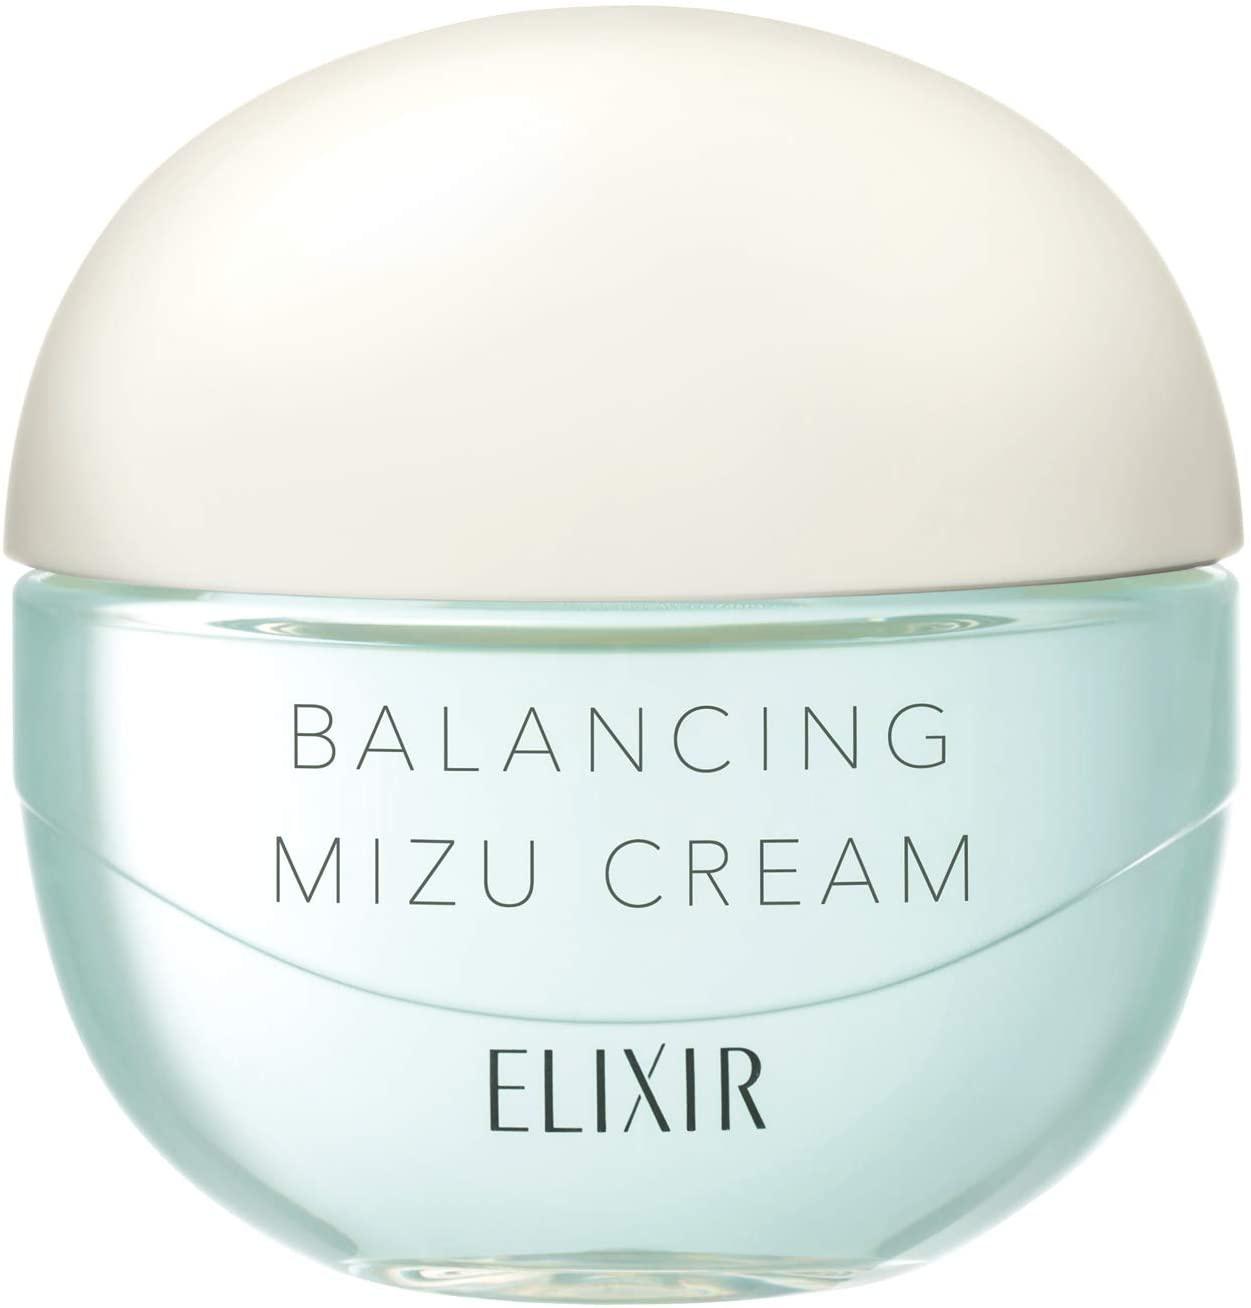 Elixir Balancing Mizu Cream